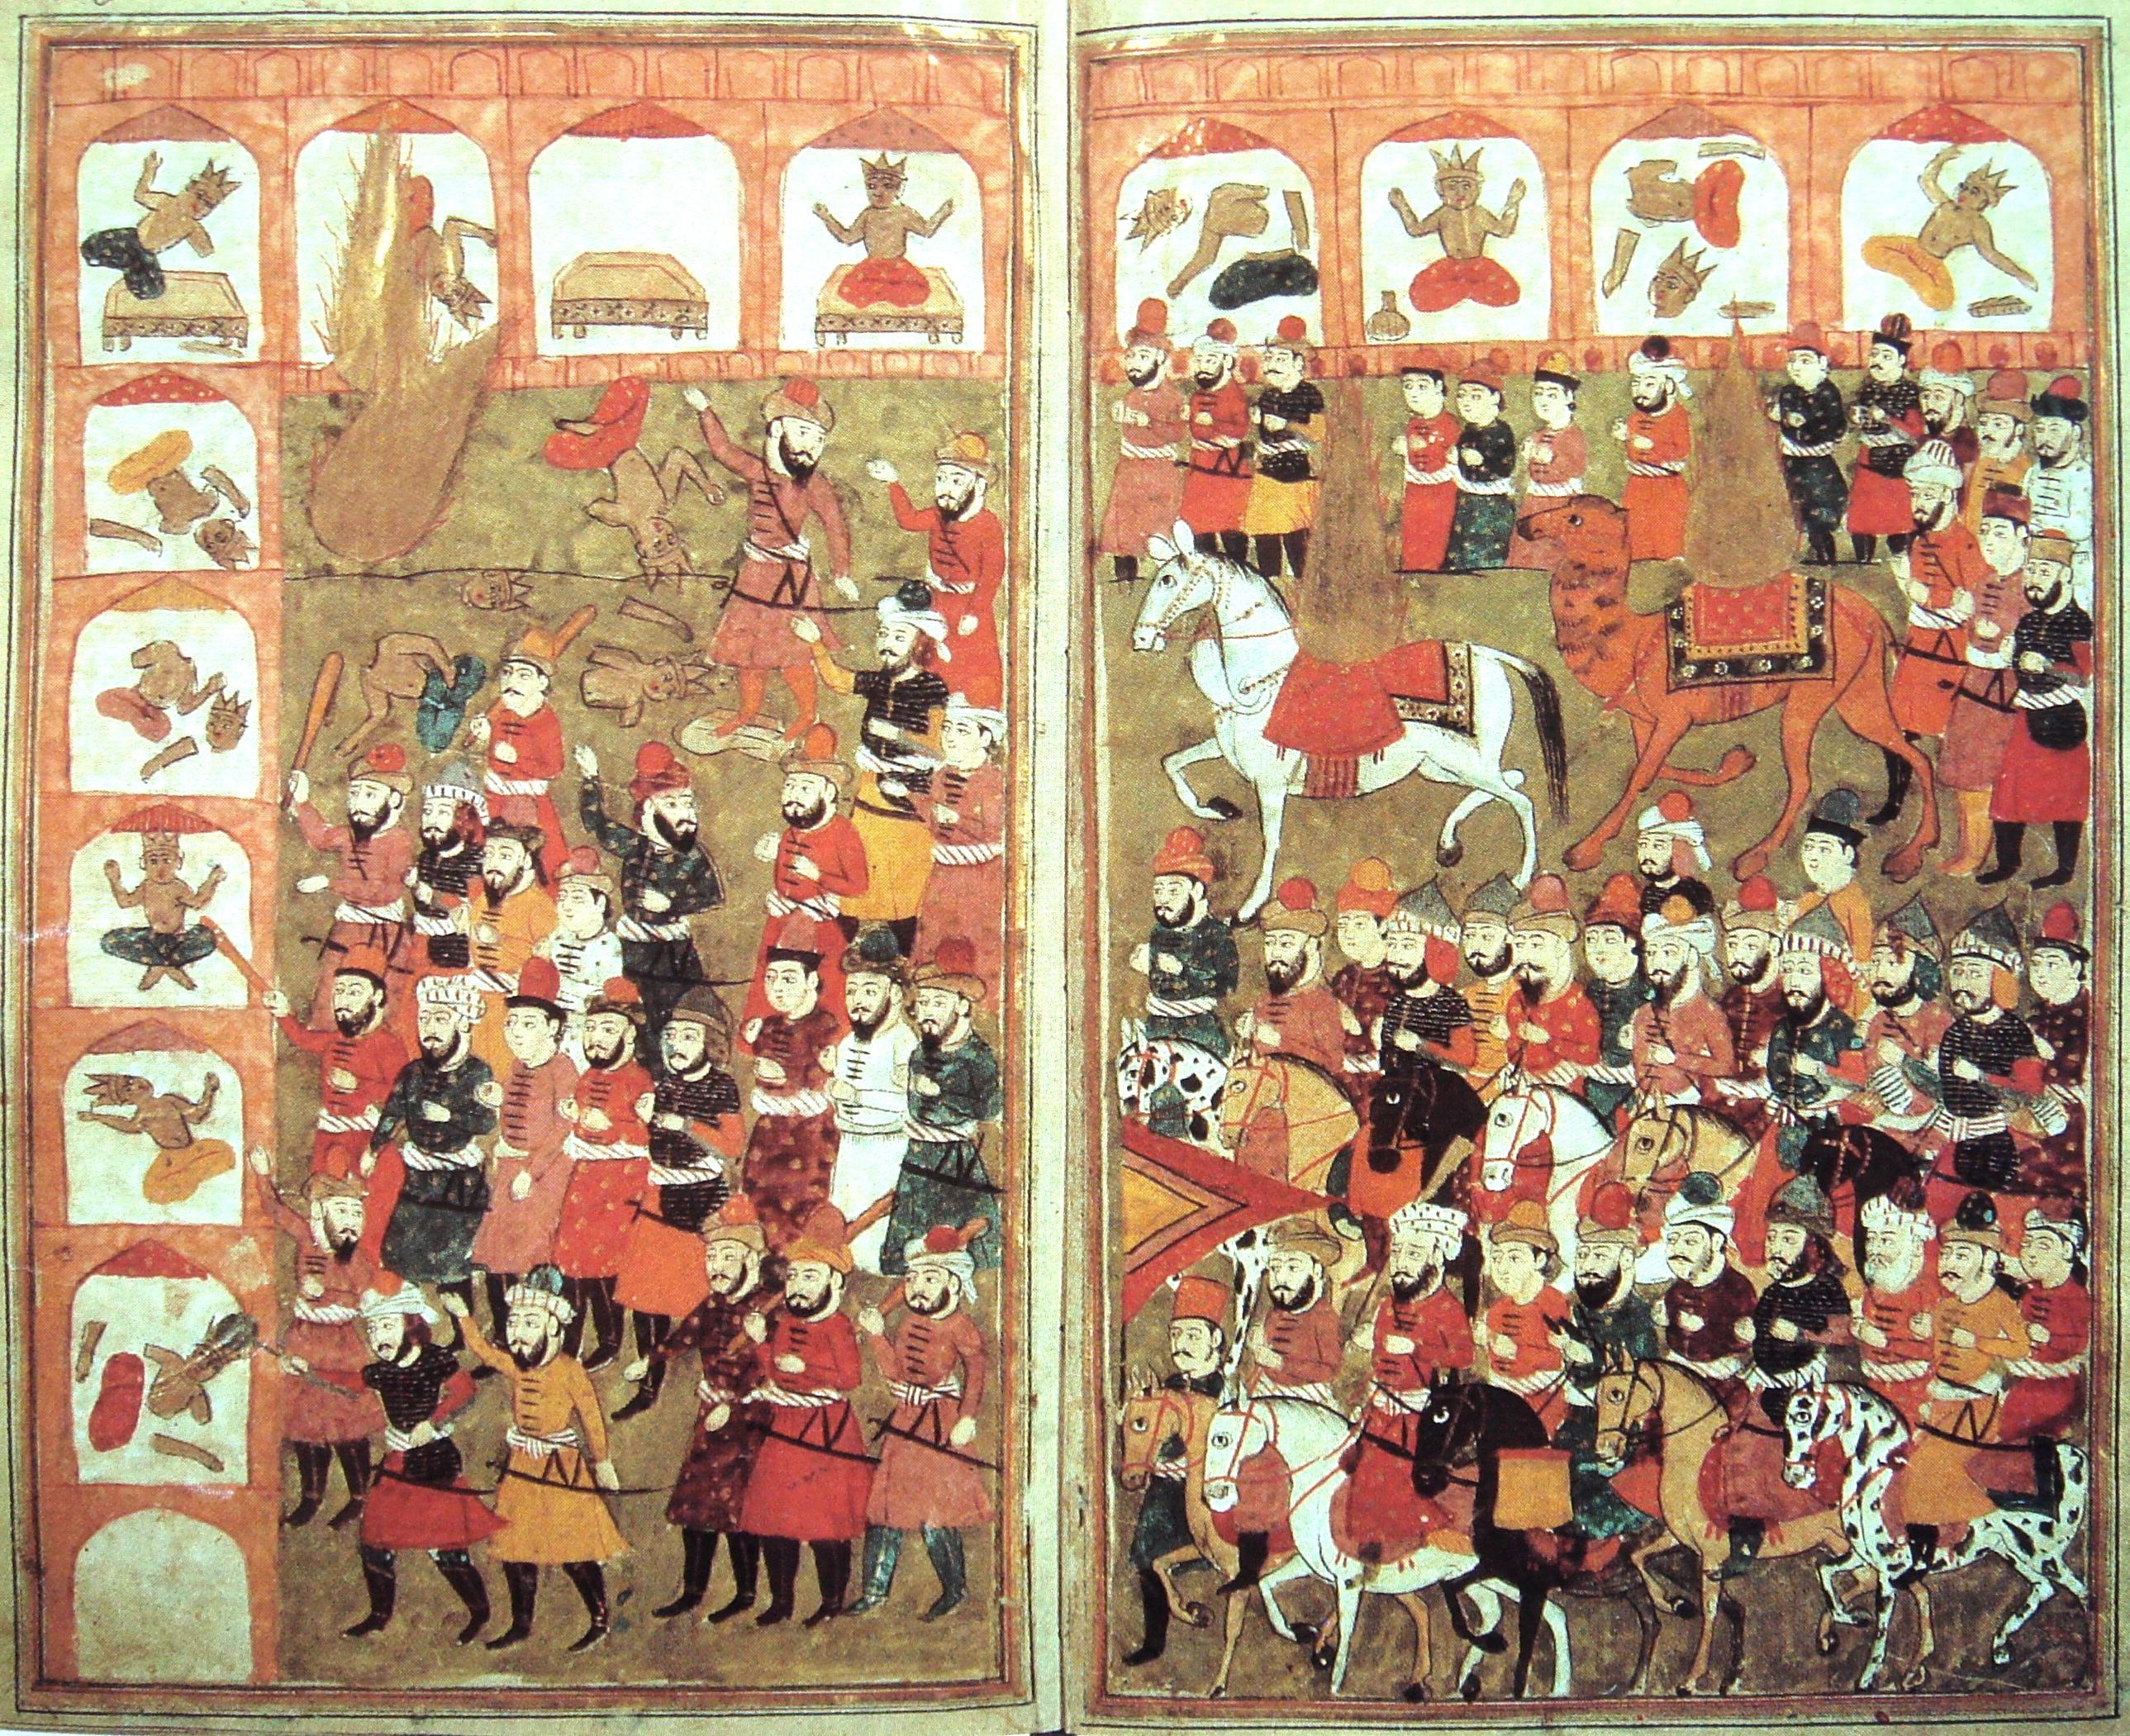 https://i0.wp.com/upload.wikimedia.org/wikipedia/commons/c/ca/Muhammad_destroying_idols_-_L%27Histoire_Merveilleuse_en_Vers_de_Mahomet_BNF.jpg